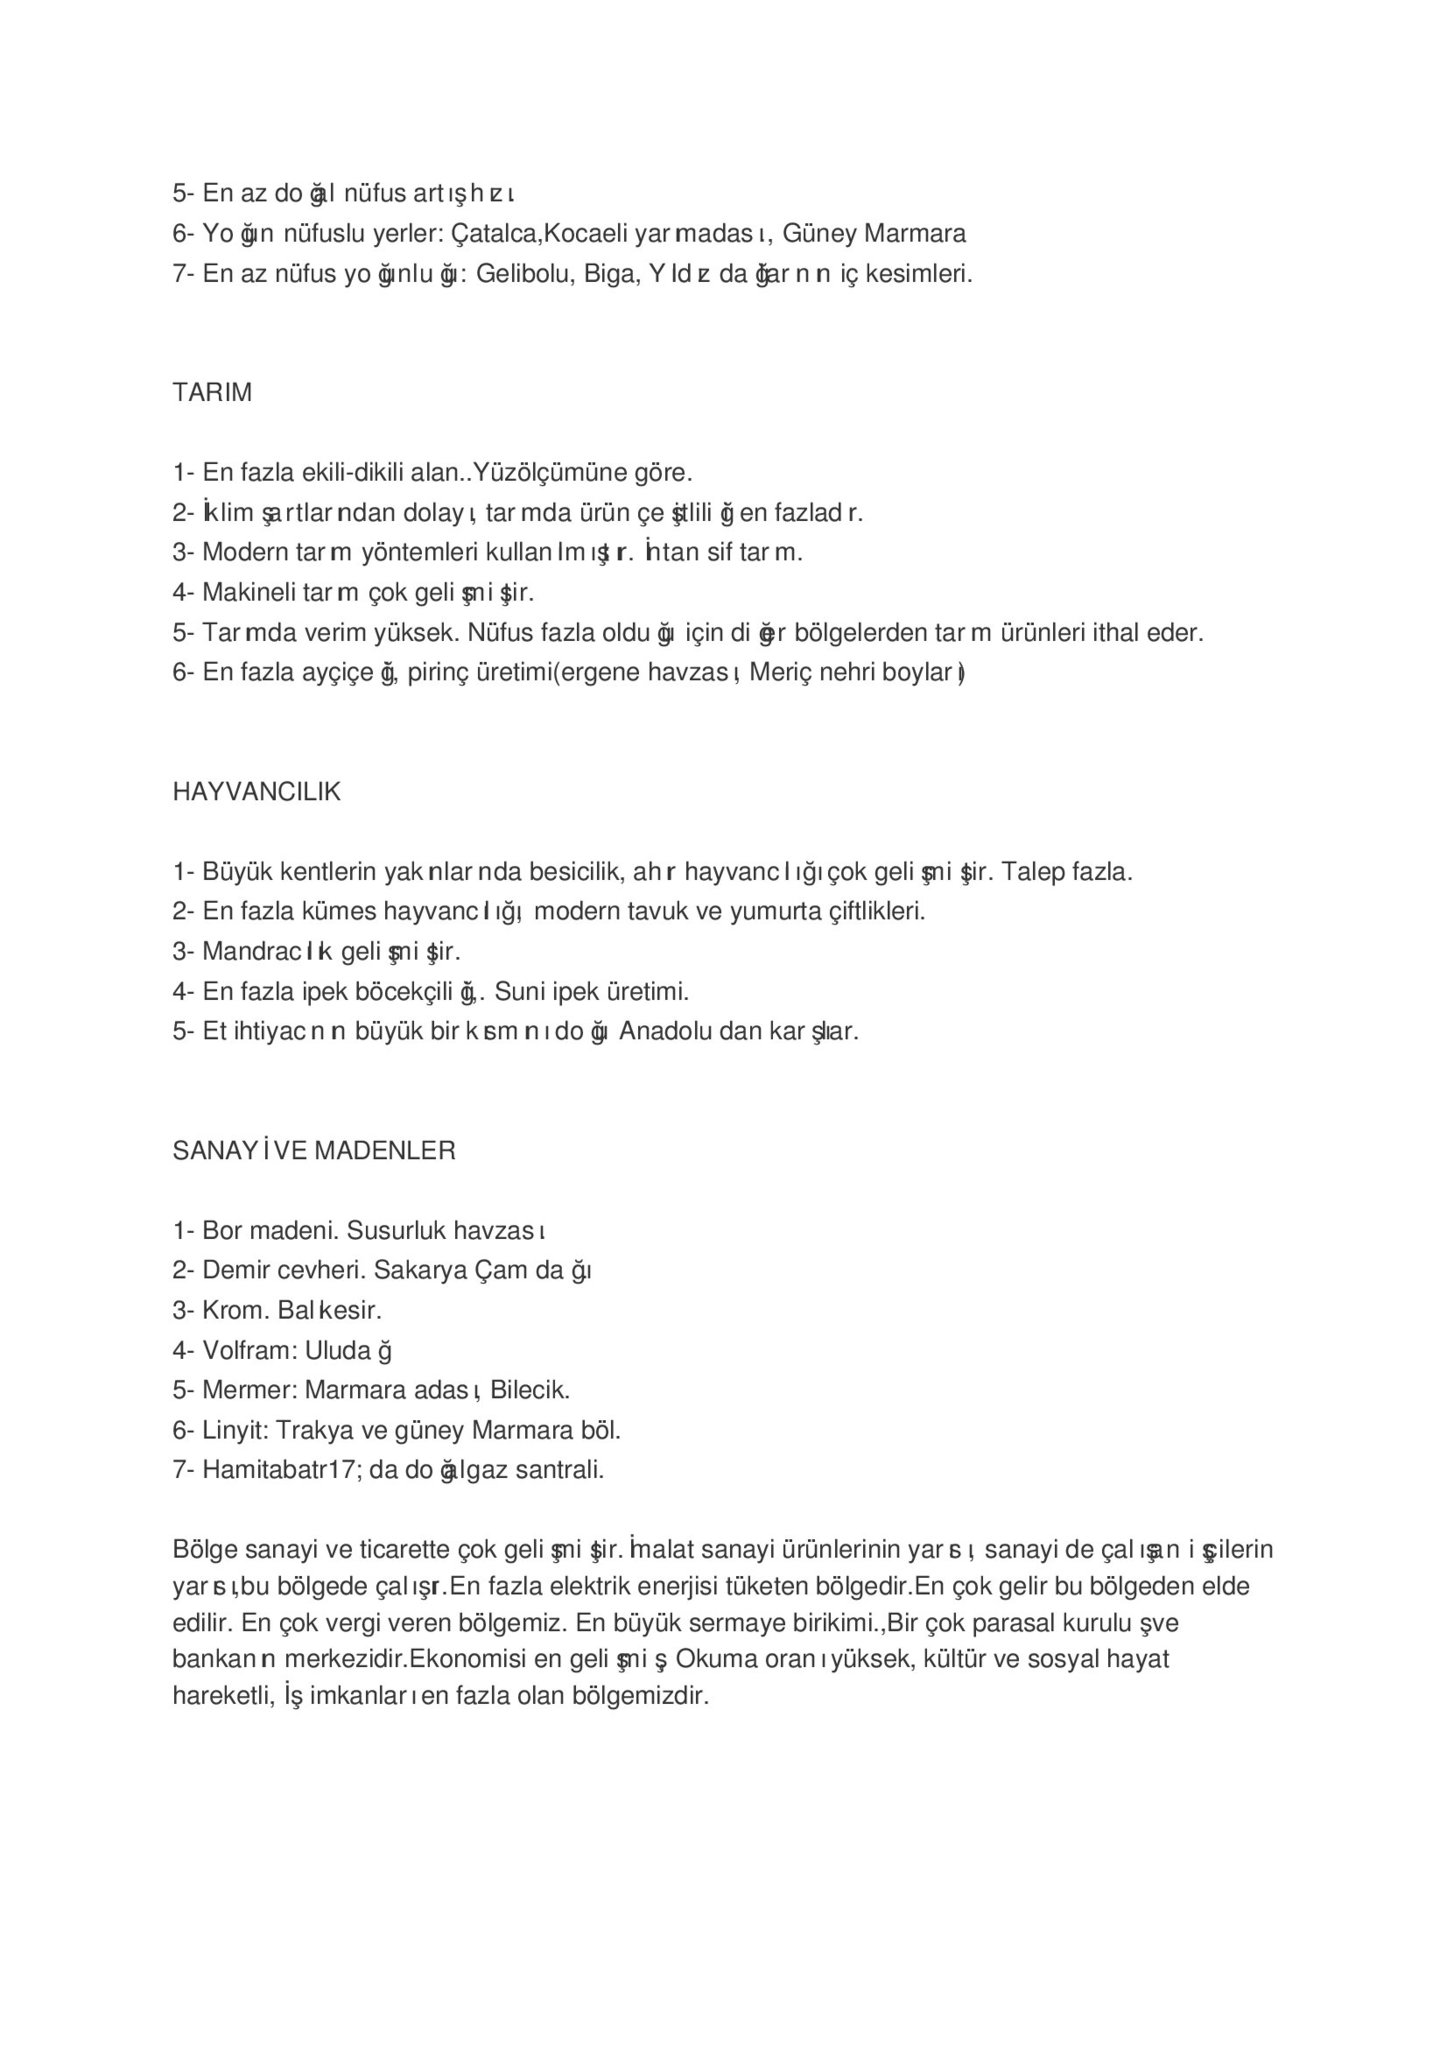 wL5AB0 - EKPSS Co�rafya Konu Anlat�mlar�